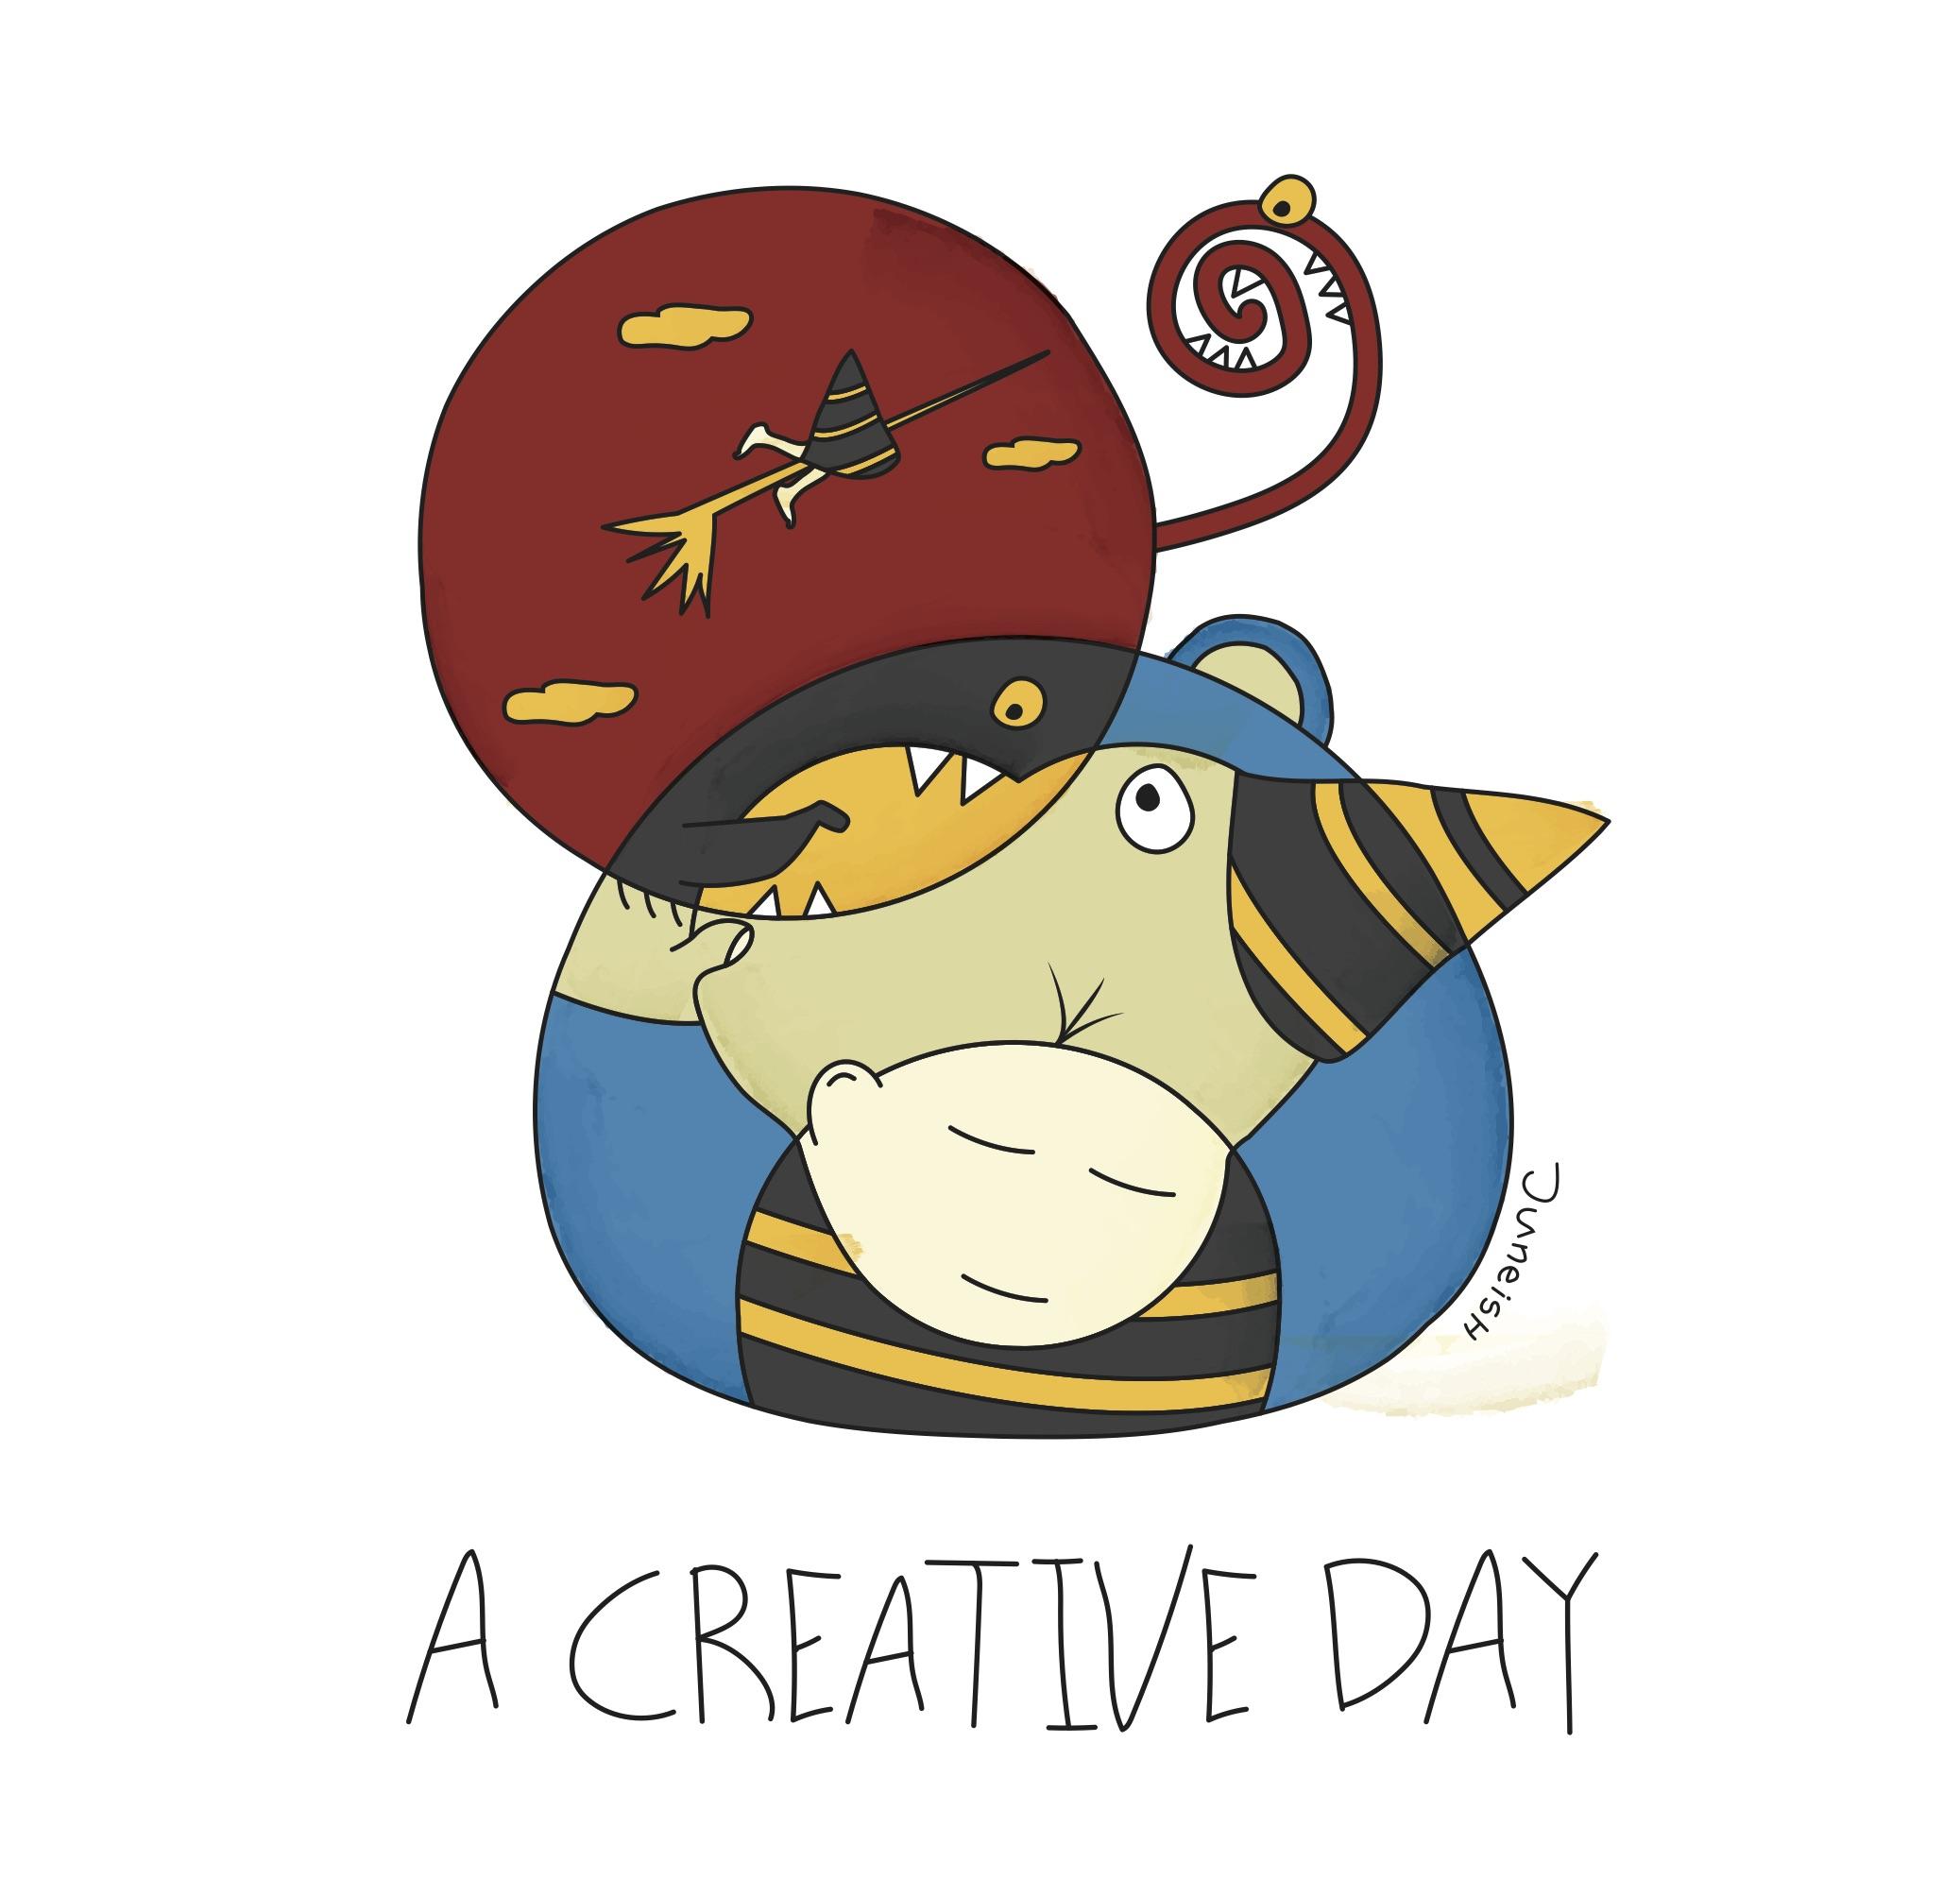 07_Creative Day.jpg